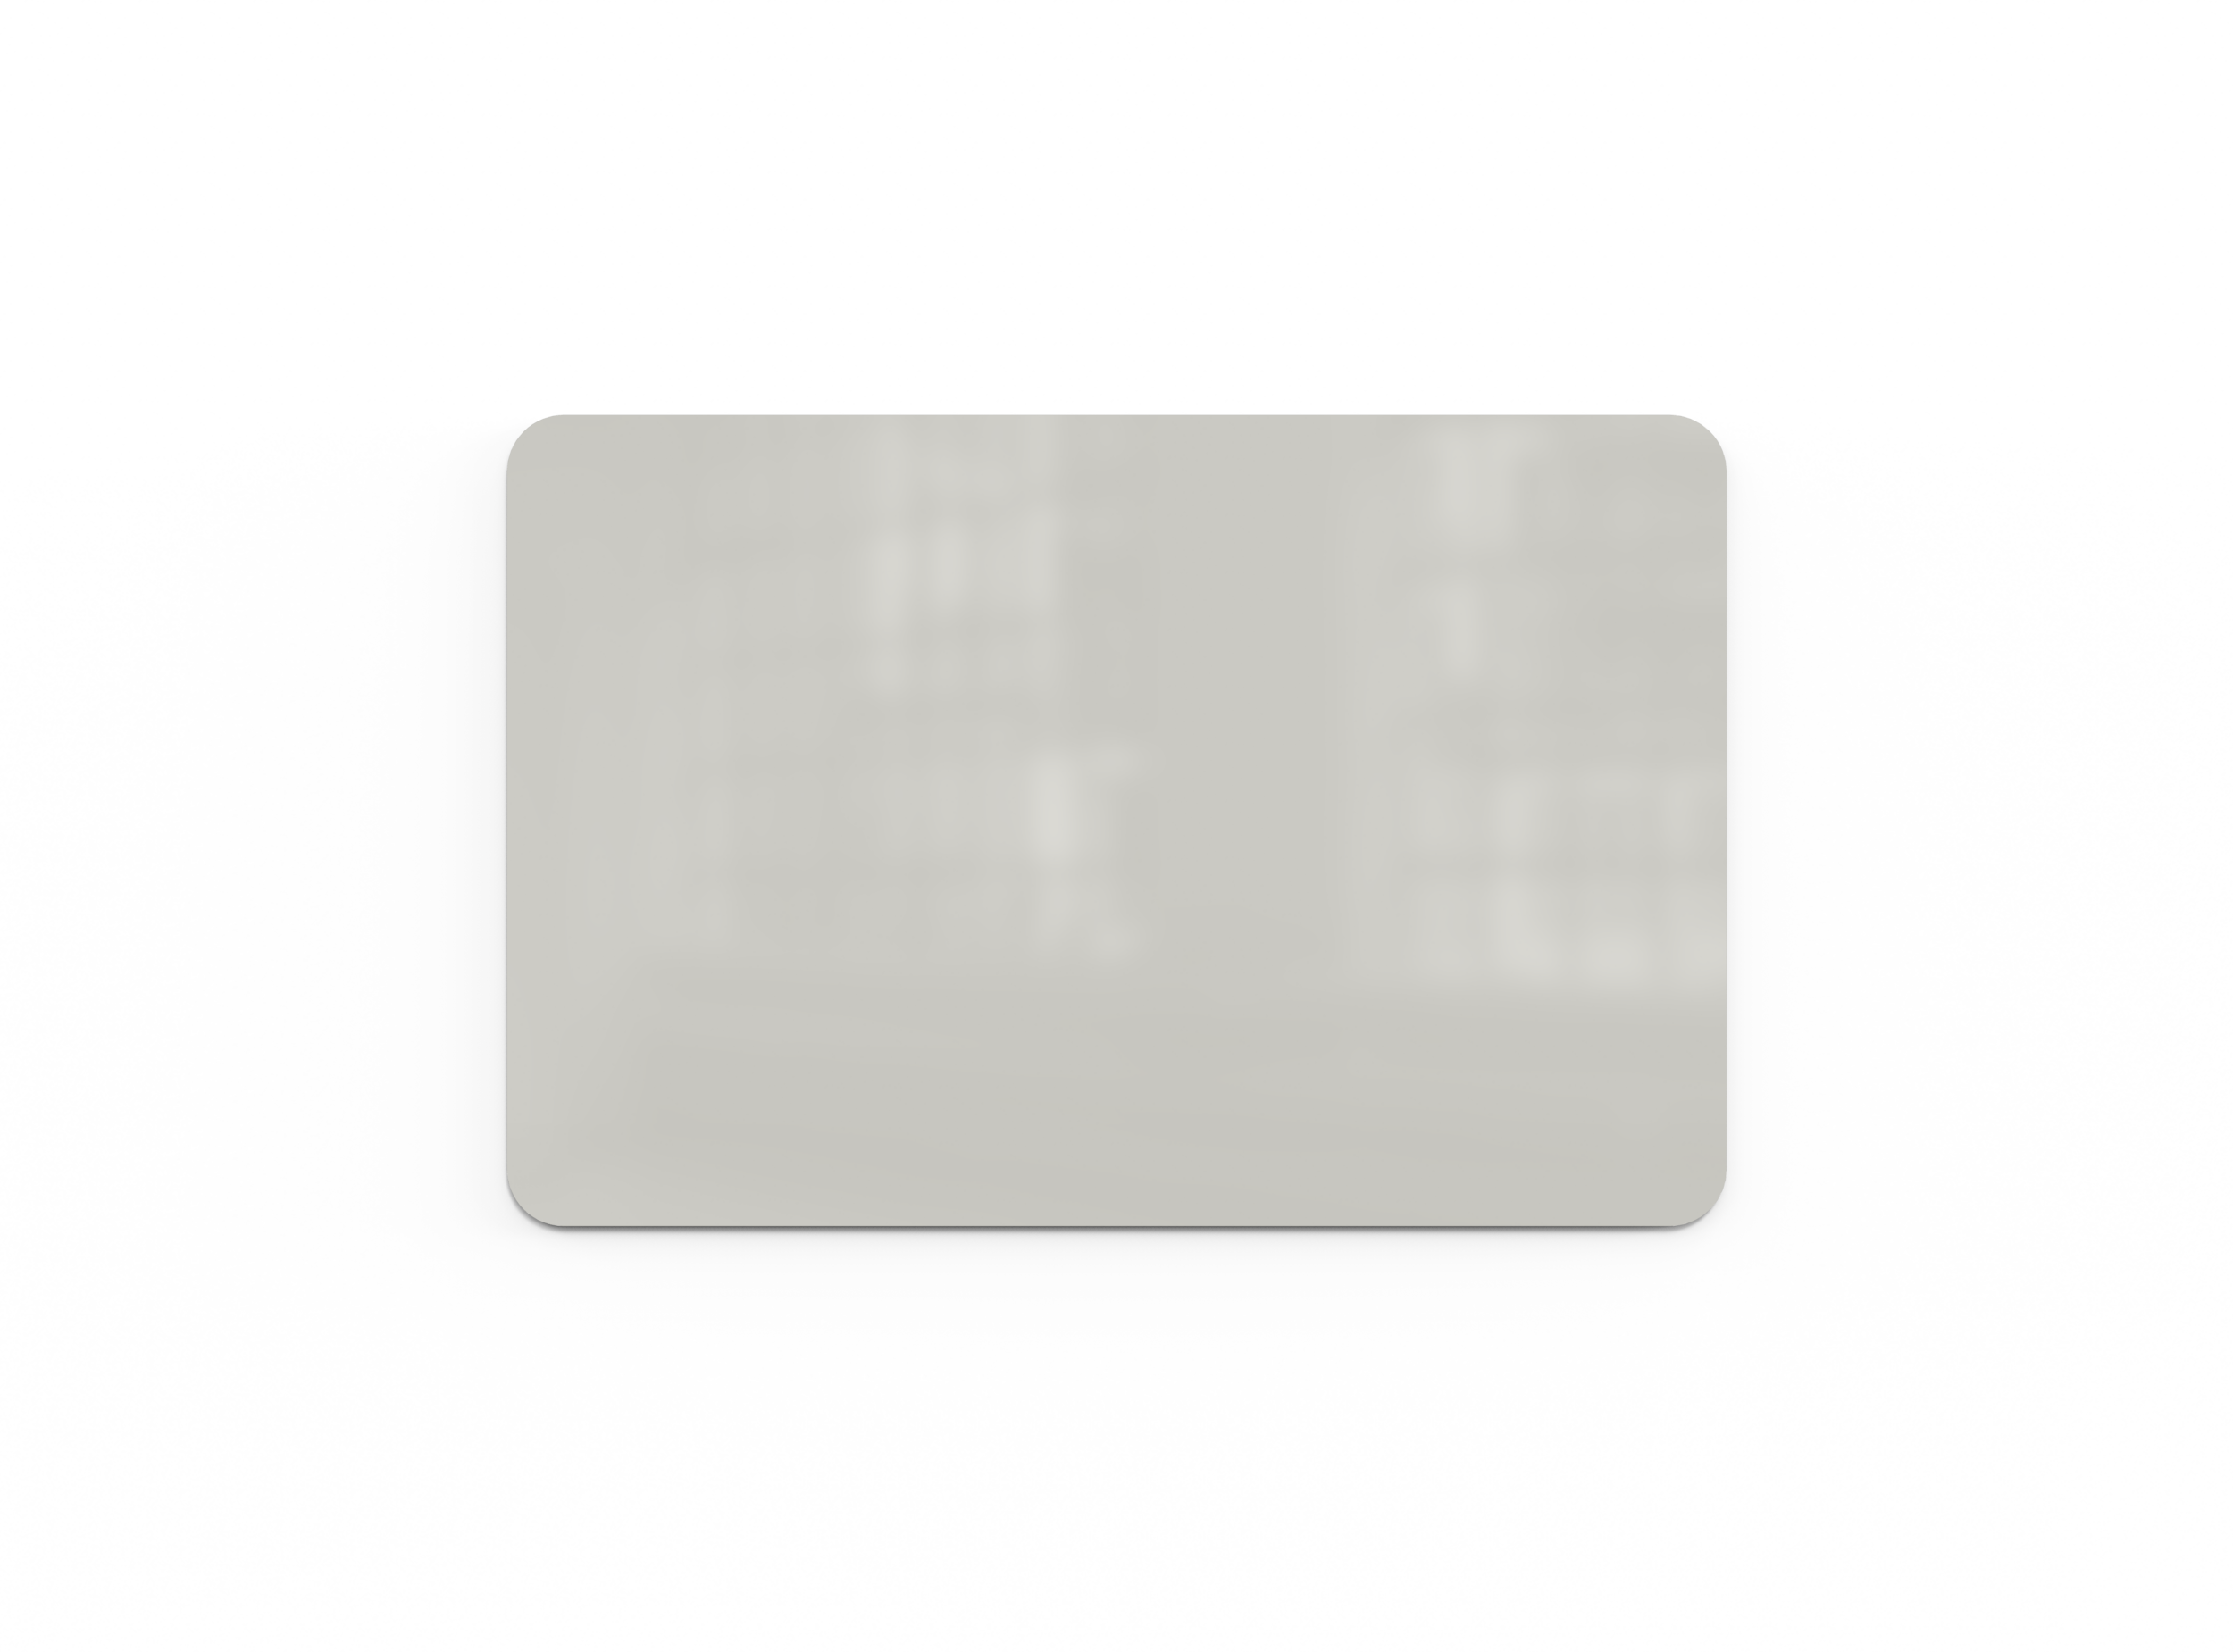 1490 x 990